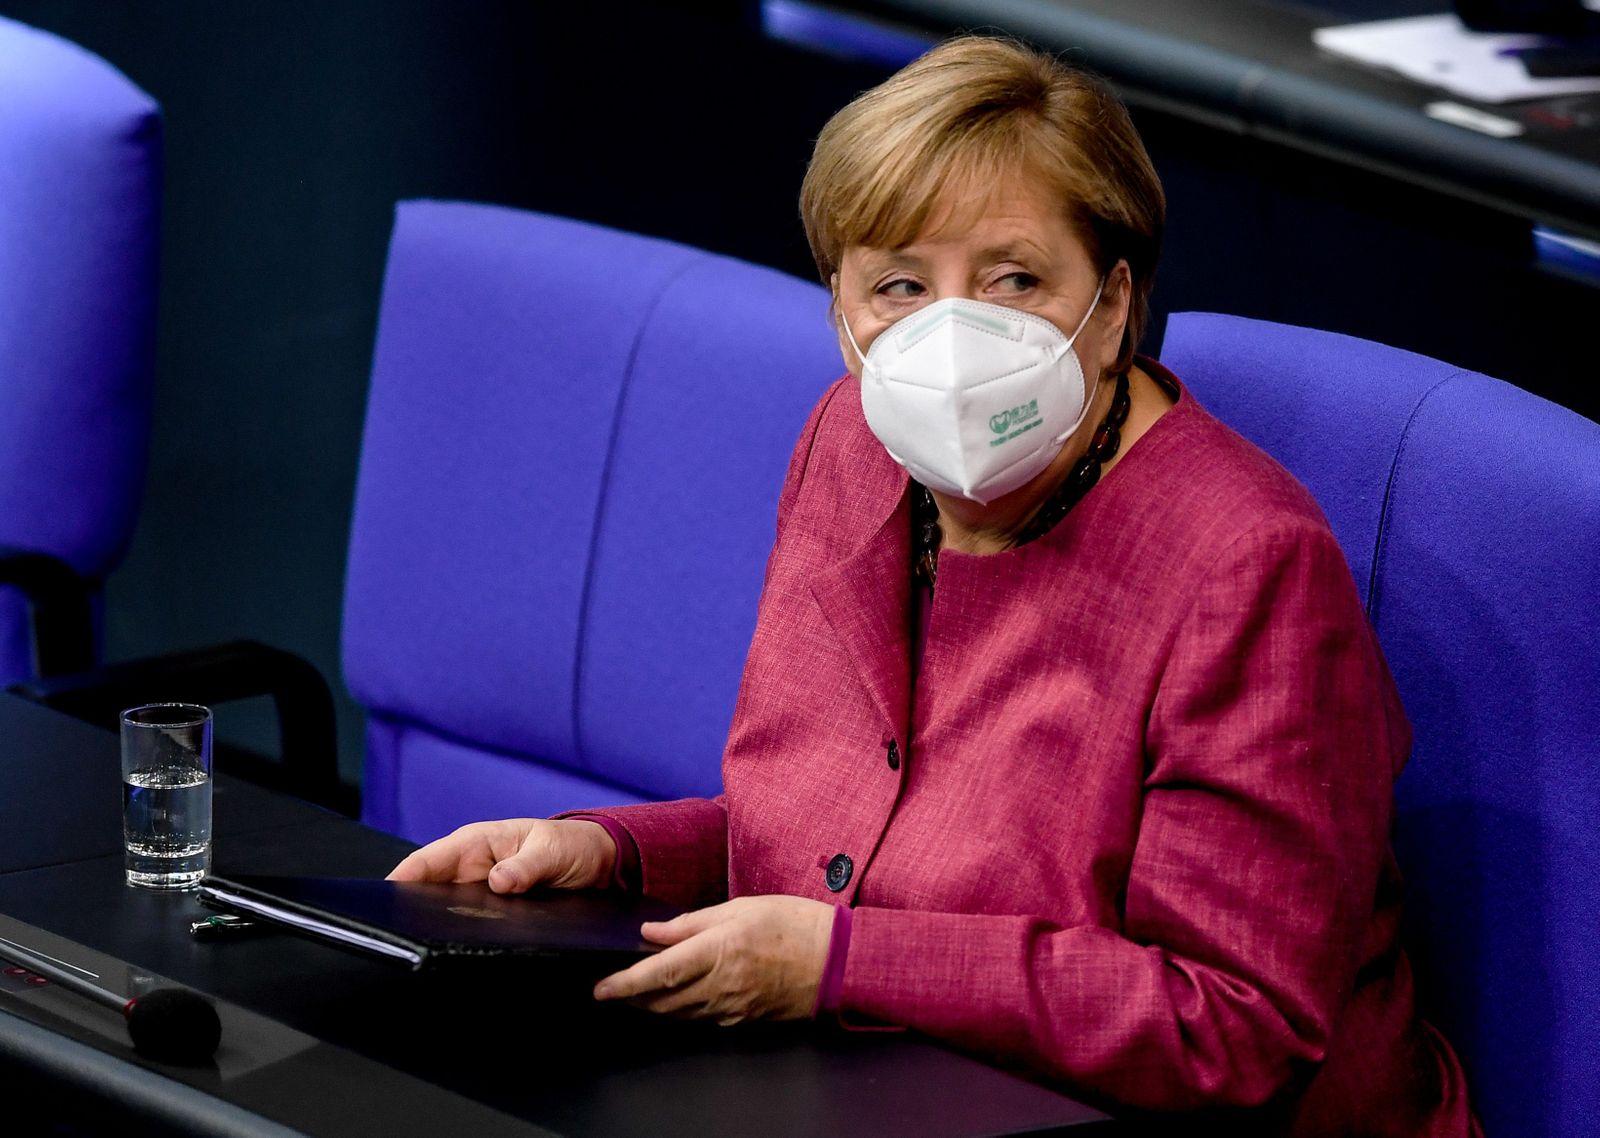 German Bundestag debates on current coronavirus situation, Berlin, Germany - 29 Oct 2020